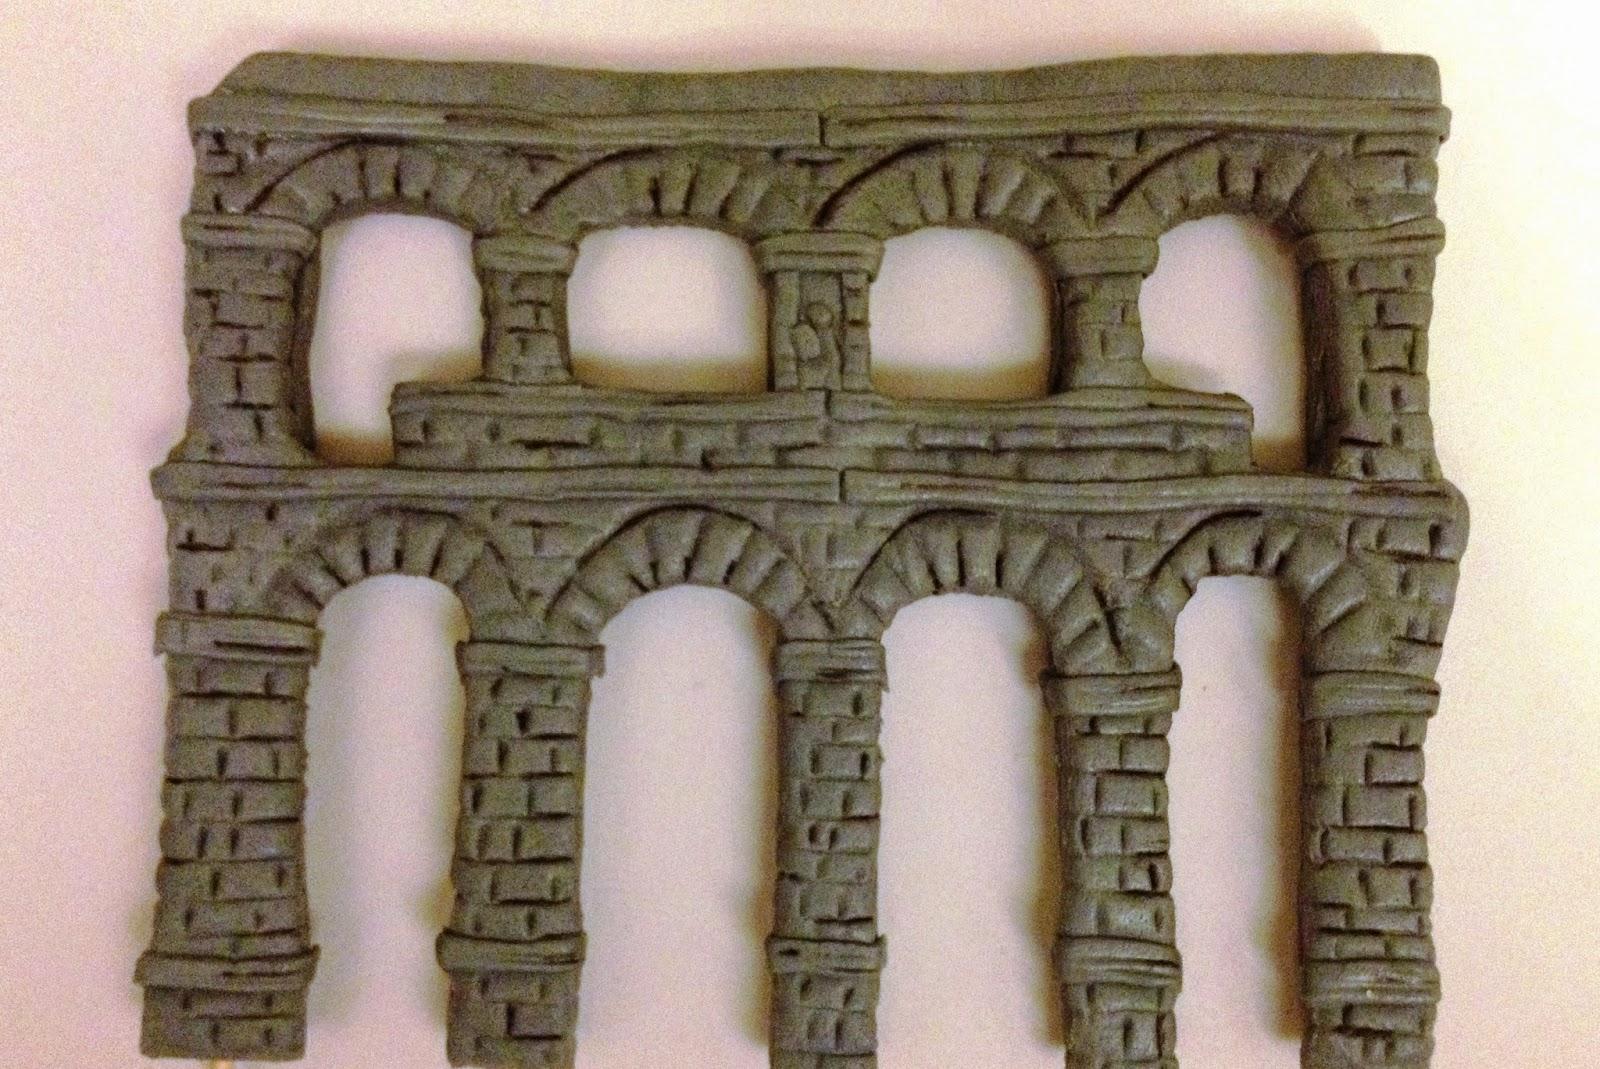 tarta fondant; tarta acueducto de segovia; Segovia; segovia; acueducto; tarta; fondant